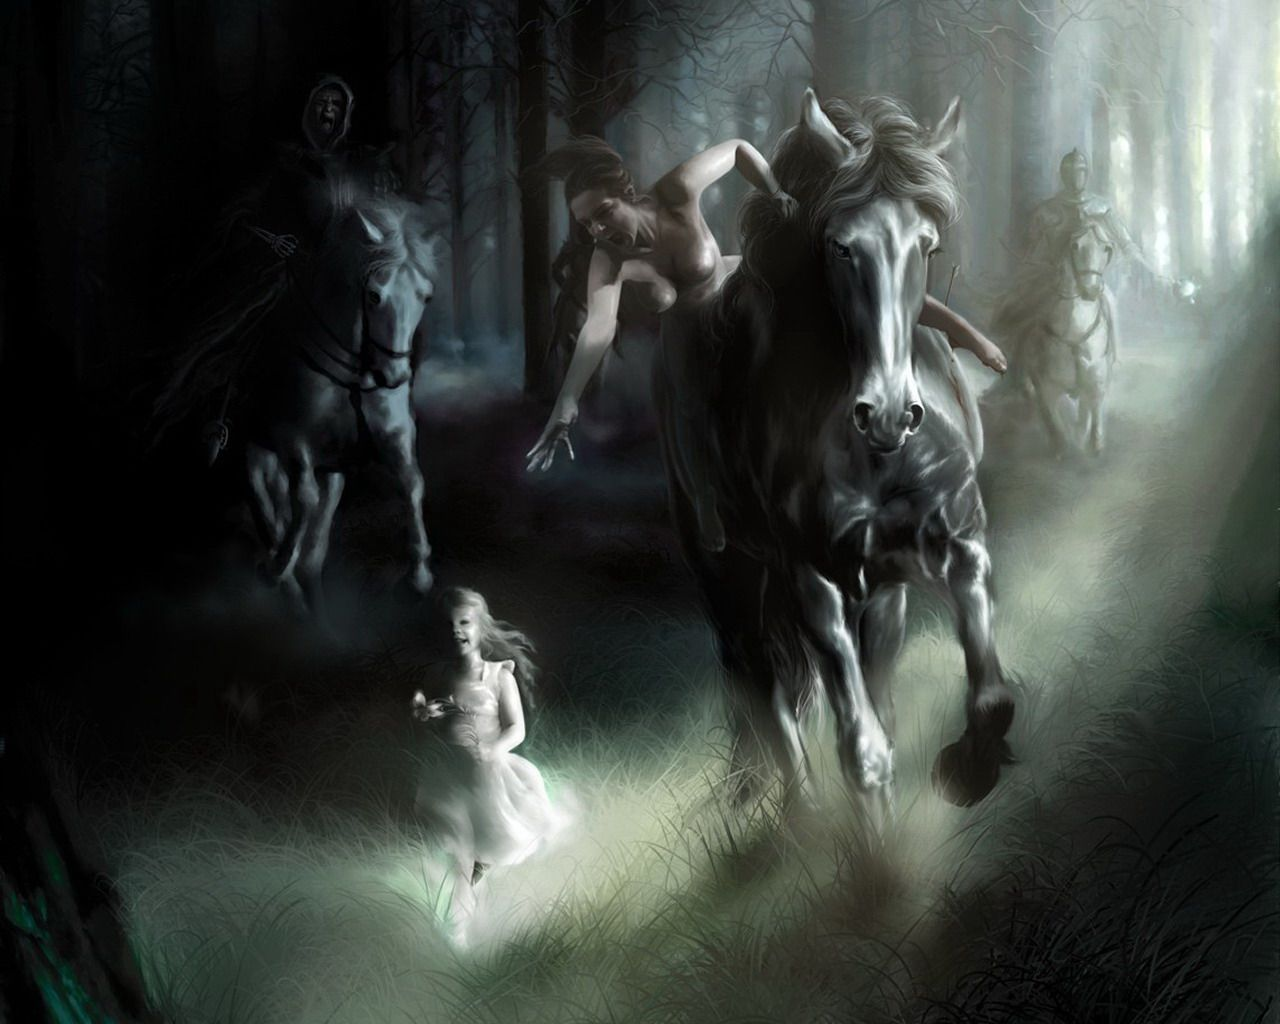 Wonderful Wallpaper Horse Gothic - 8e00afc0798613d988b8a0c135b82f31  You Should Have_1003150.jpg